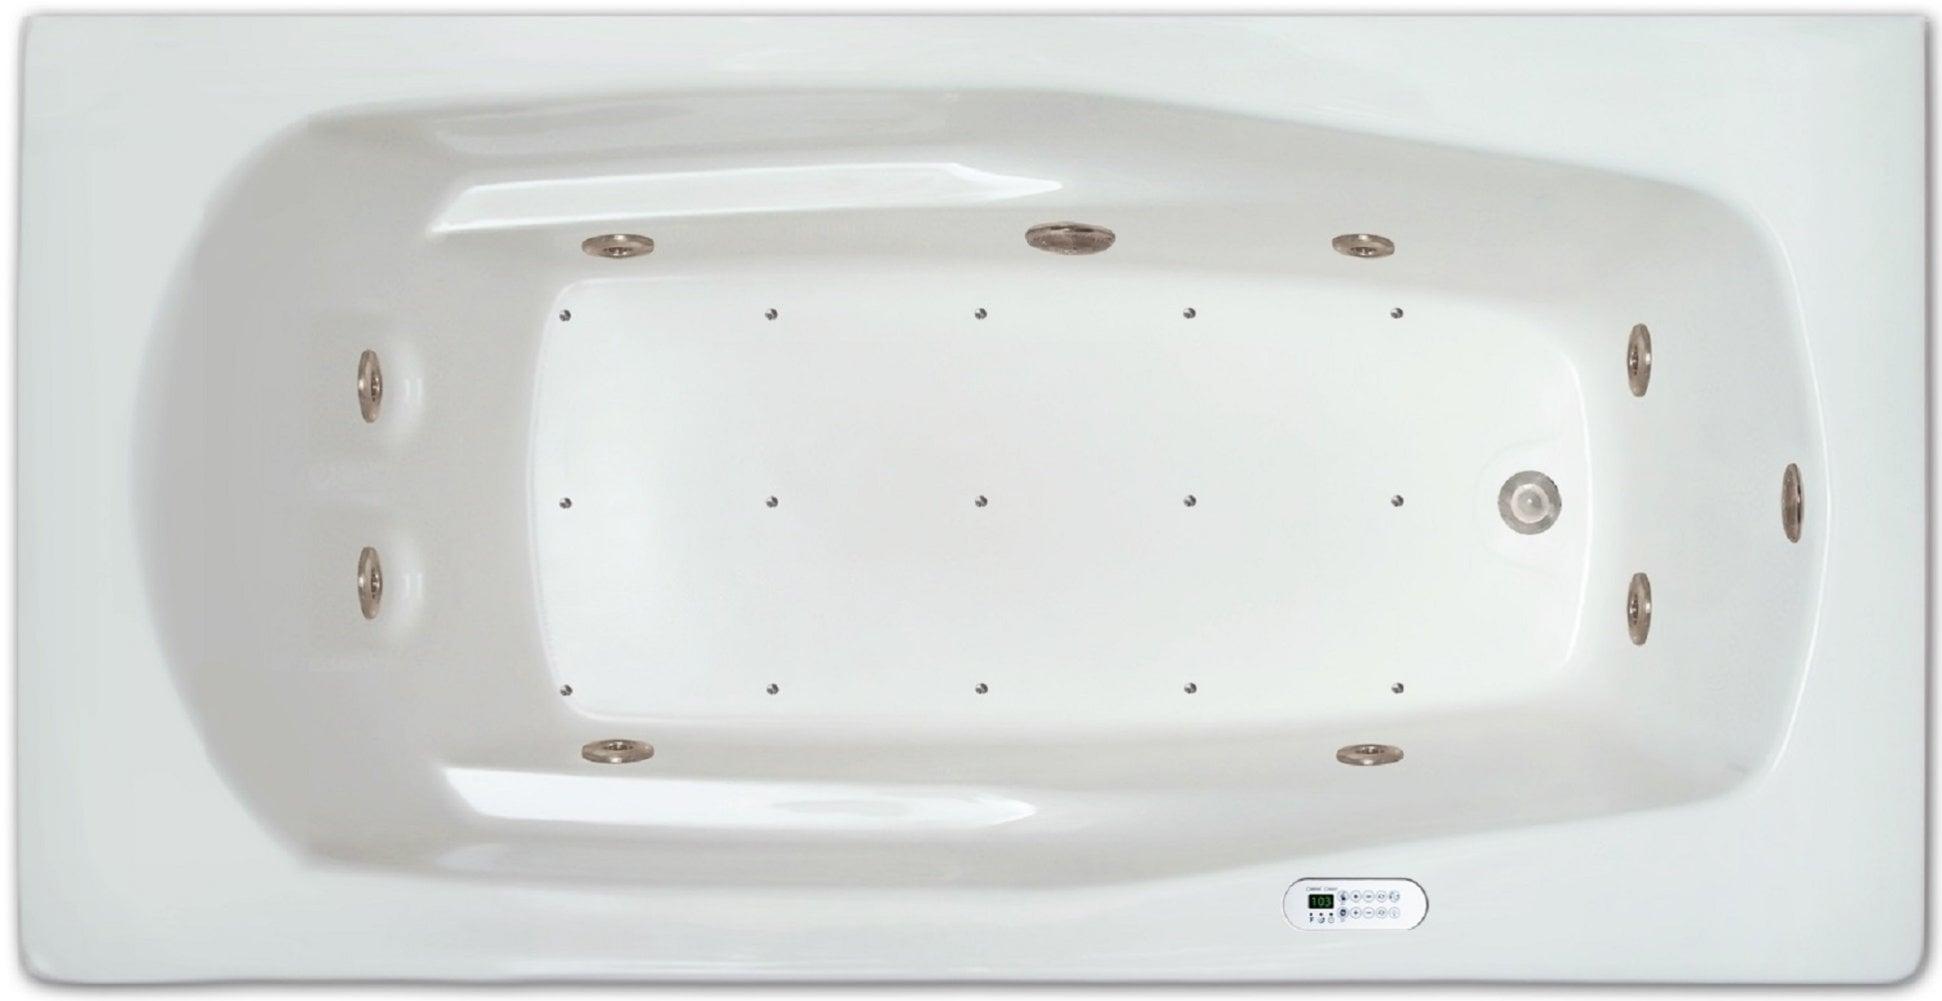 Drop-in Bathtub / 66x32x18.5 / high gloss white acrylic / Rectangle / LPI19-C-LD Pinnacle Bath - Air/Whirlpool Combo 0